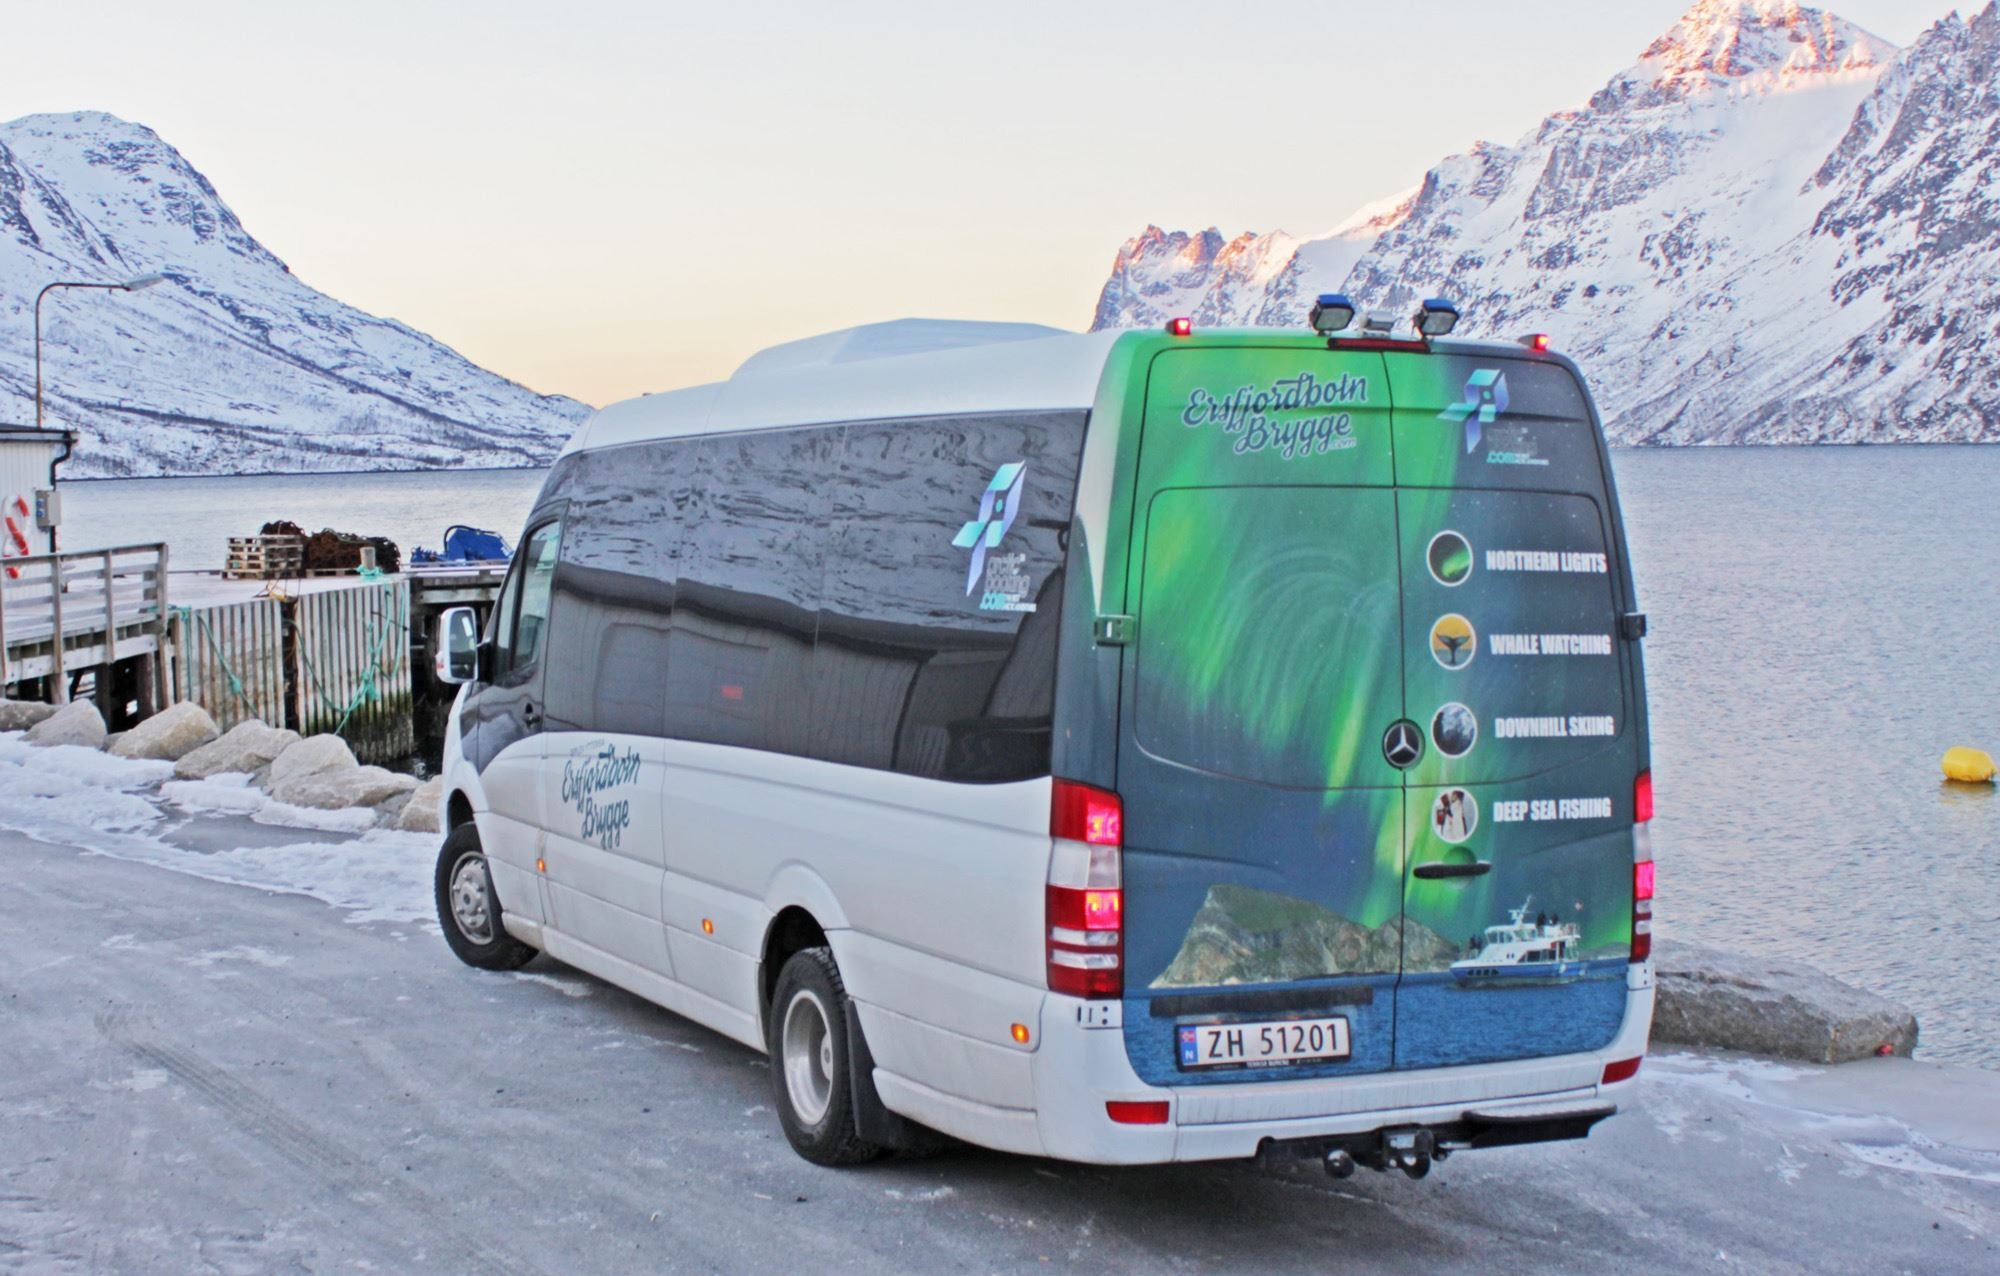 Fjord tour by bus around Kvaløya daytime – Ersfjordbotn Brygge